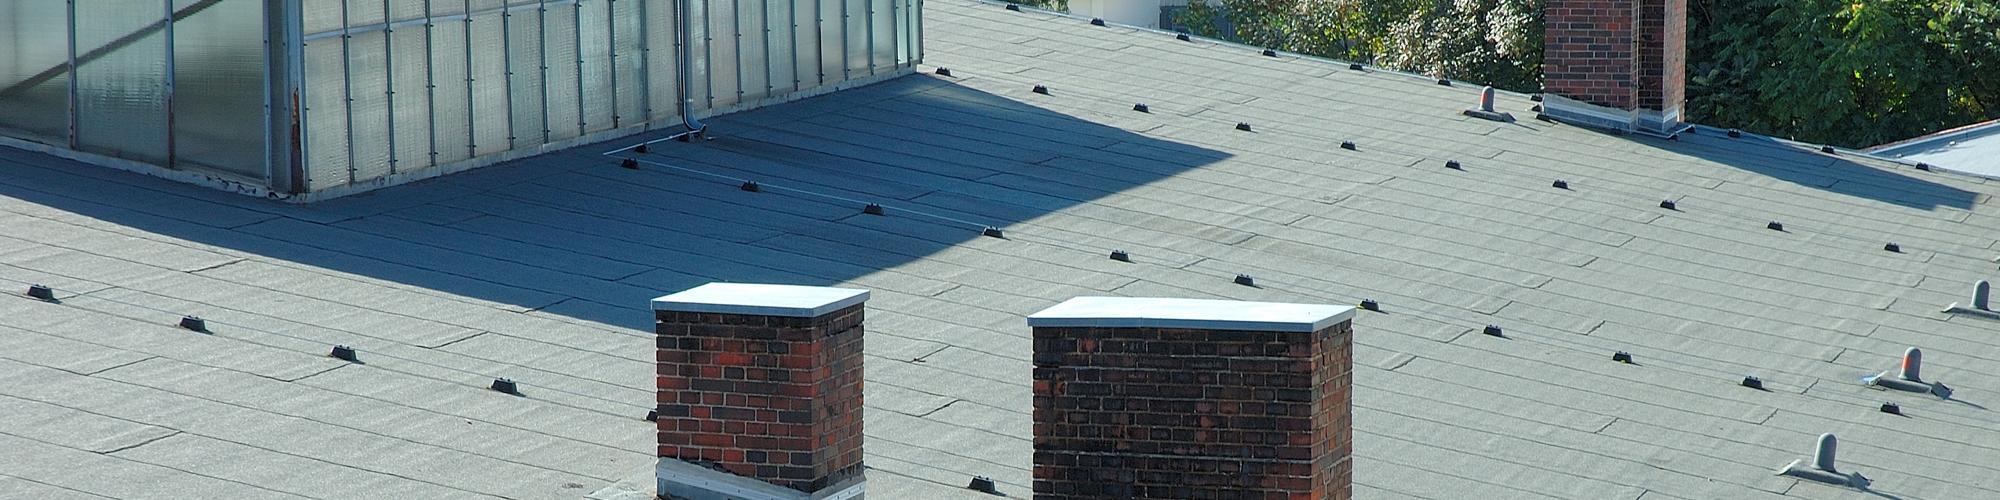 St Petersburg Fl Roofing The Best Room Design